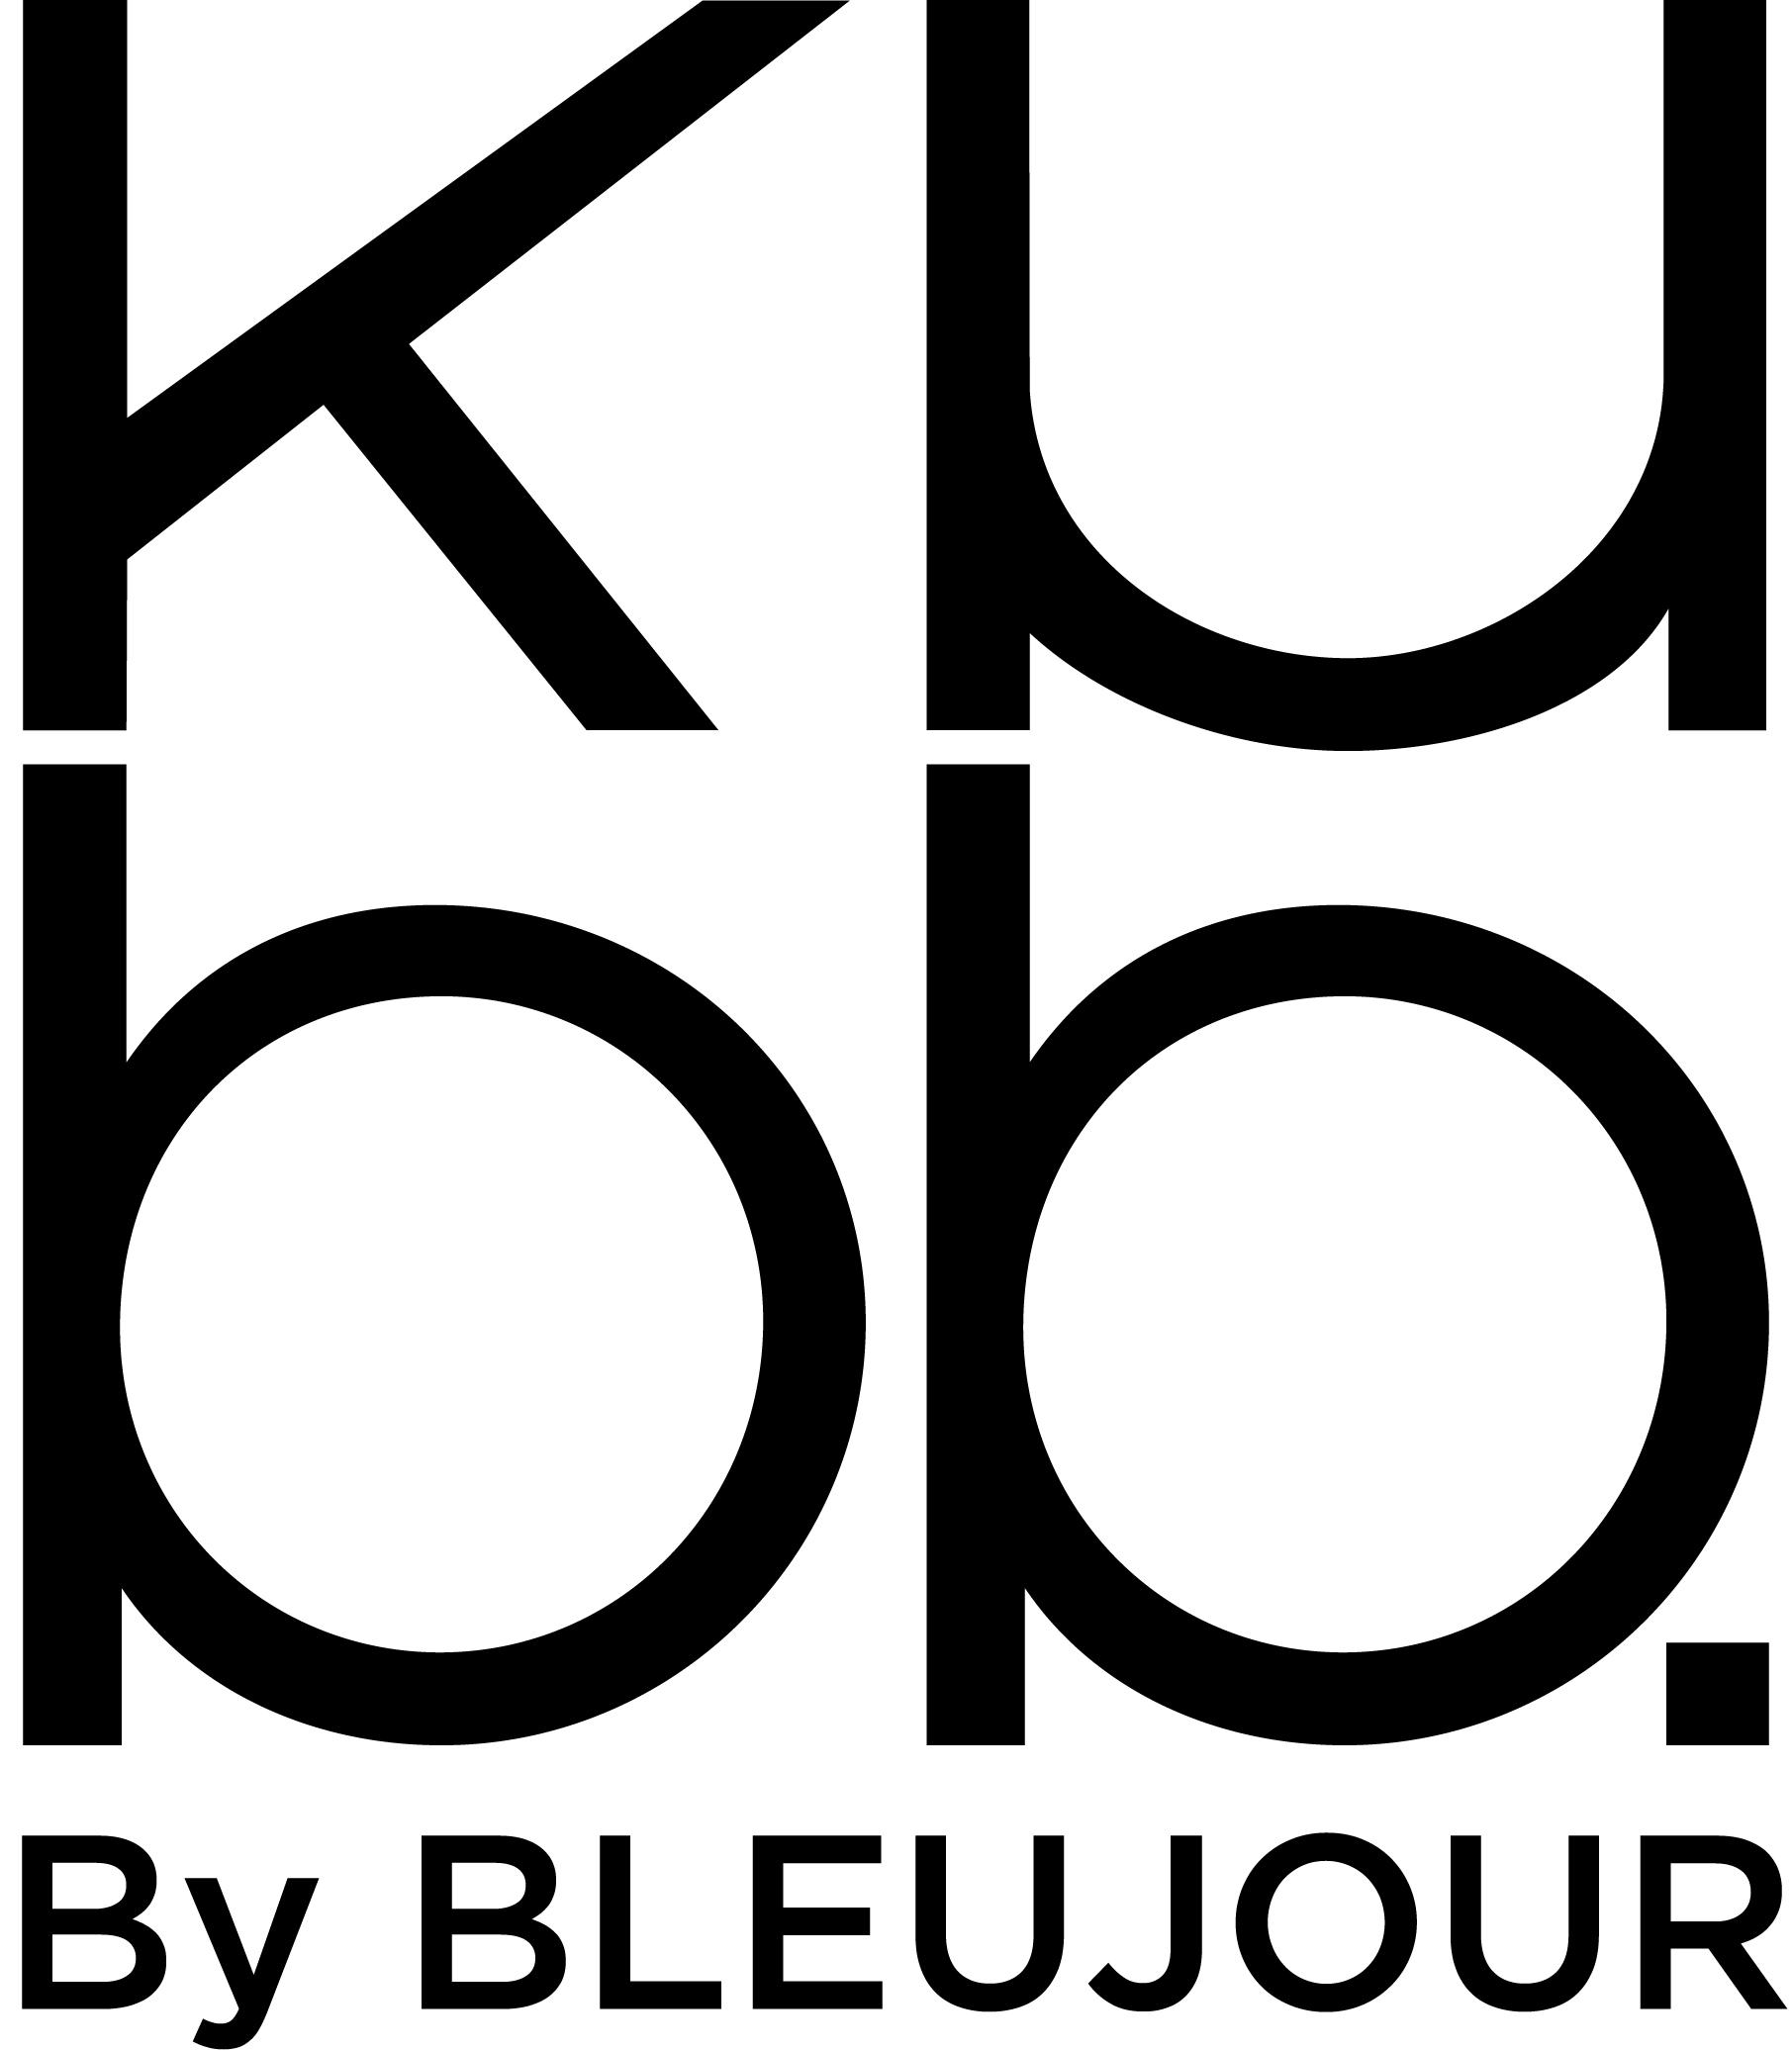 https://www.bleujour.com/wp-content/uploads/2018/12/Kubb-By_Bleujour_Noir.jpg